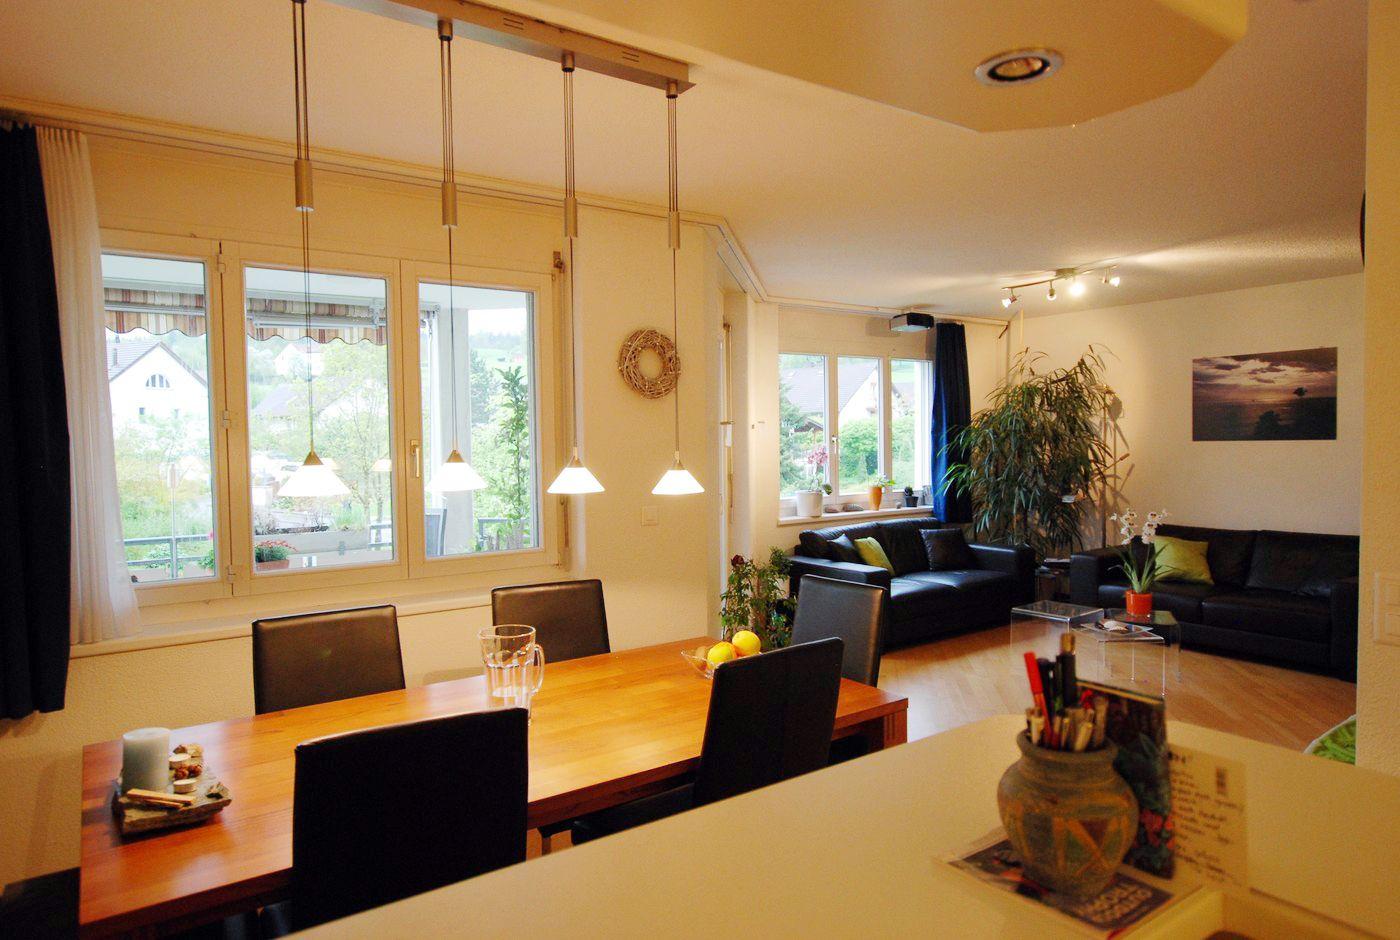 Wohnungen Mieten Winterthur Frauenfelderstrasse Winterthur